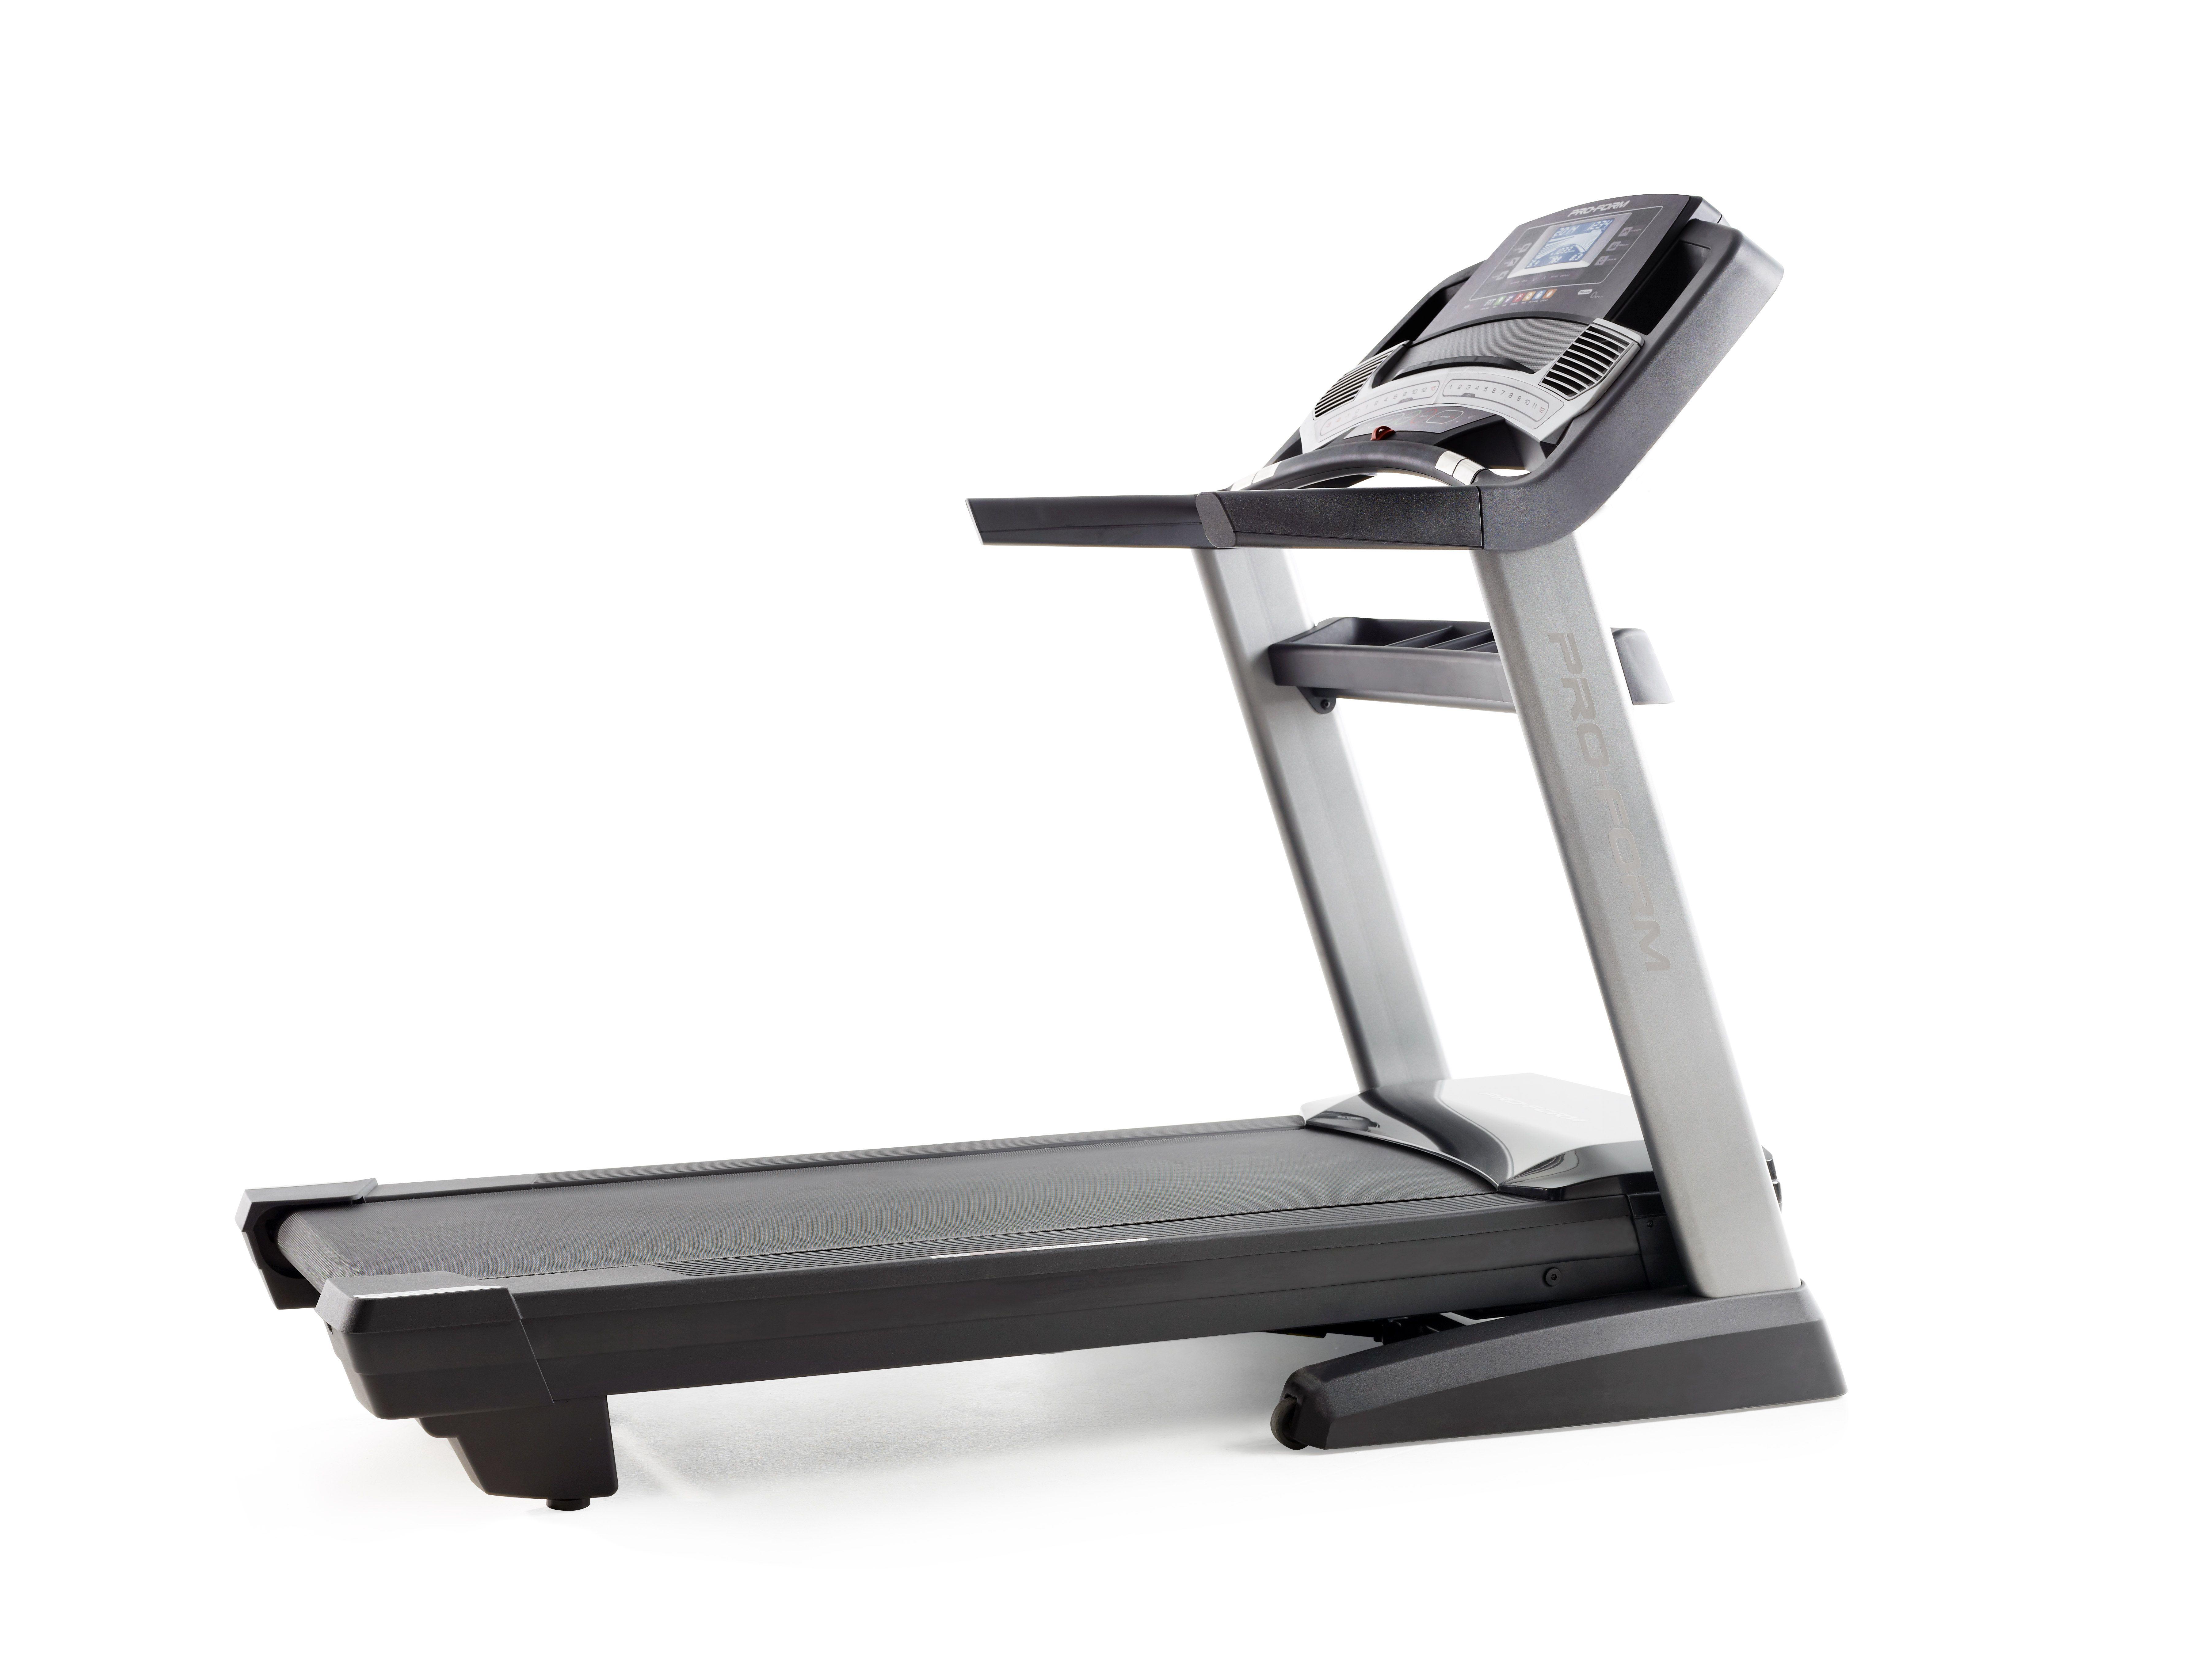 Treadmill Support Proform Support Treadmill Treadmill Reviews Workout Machines